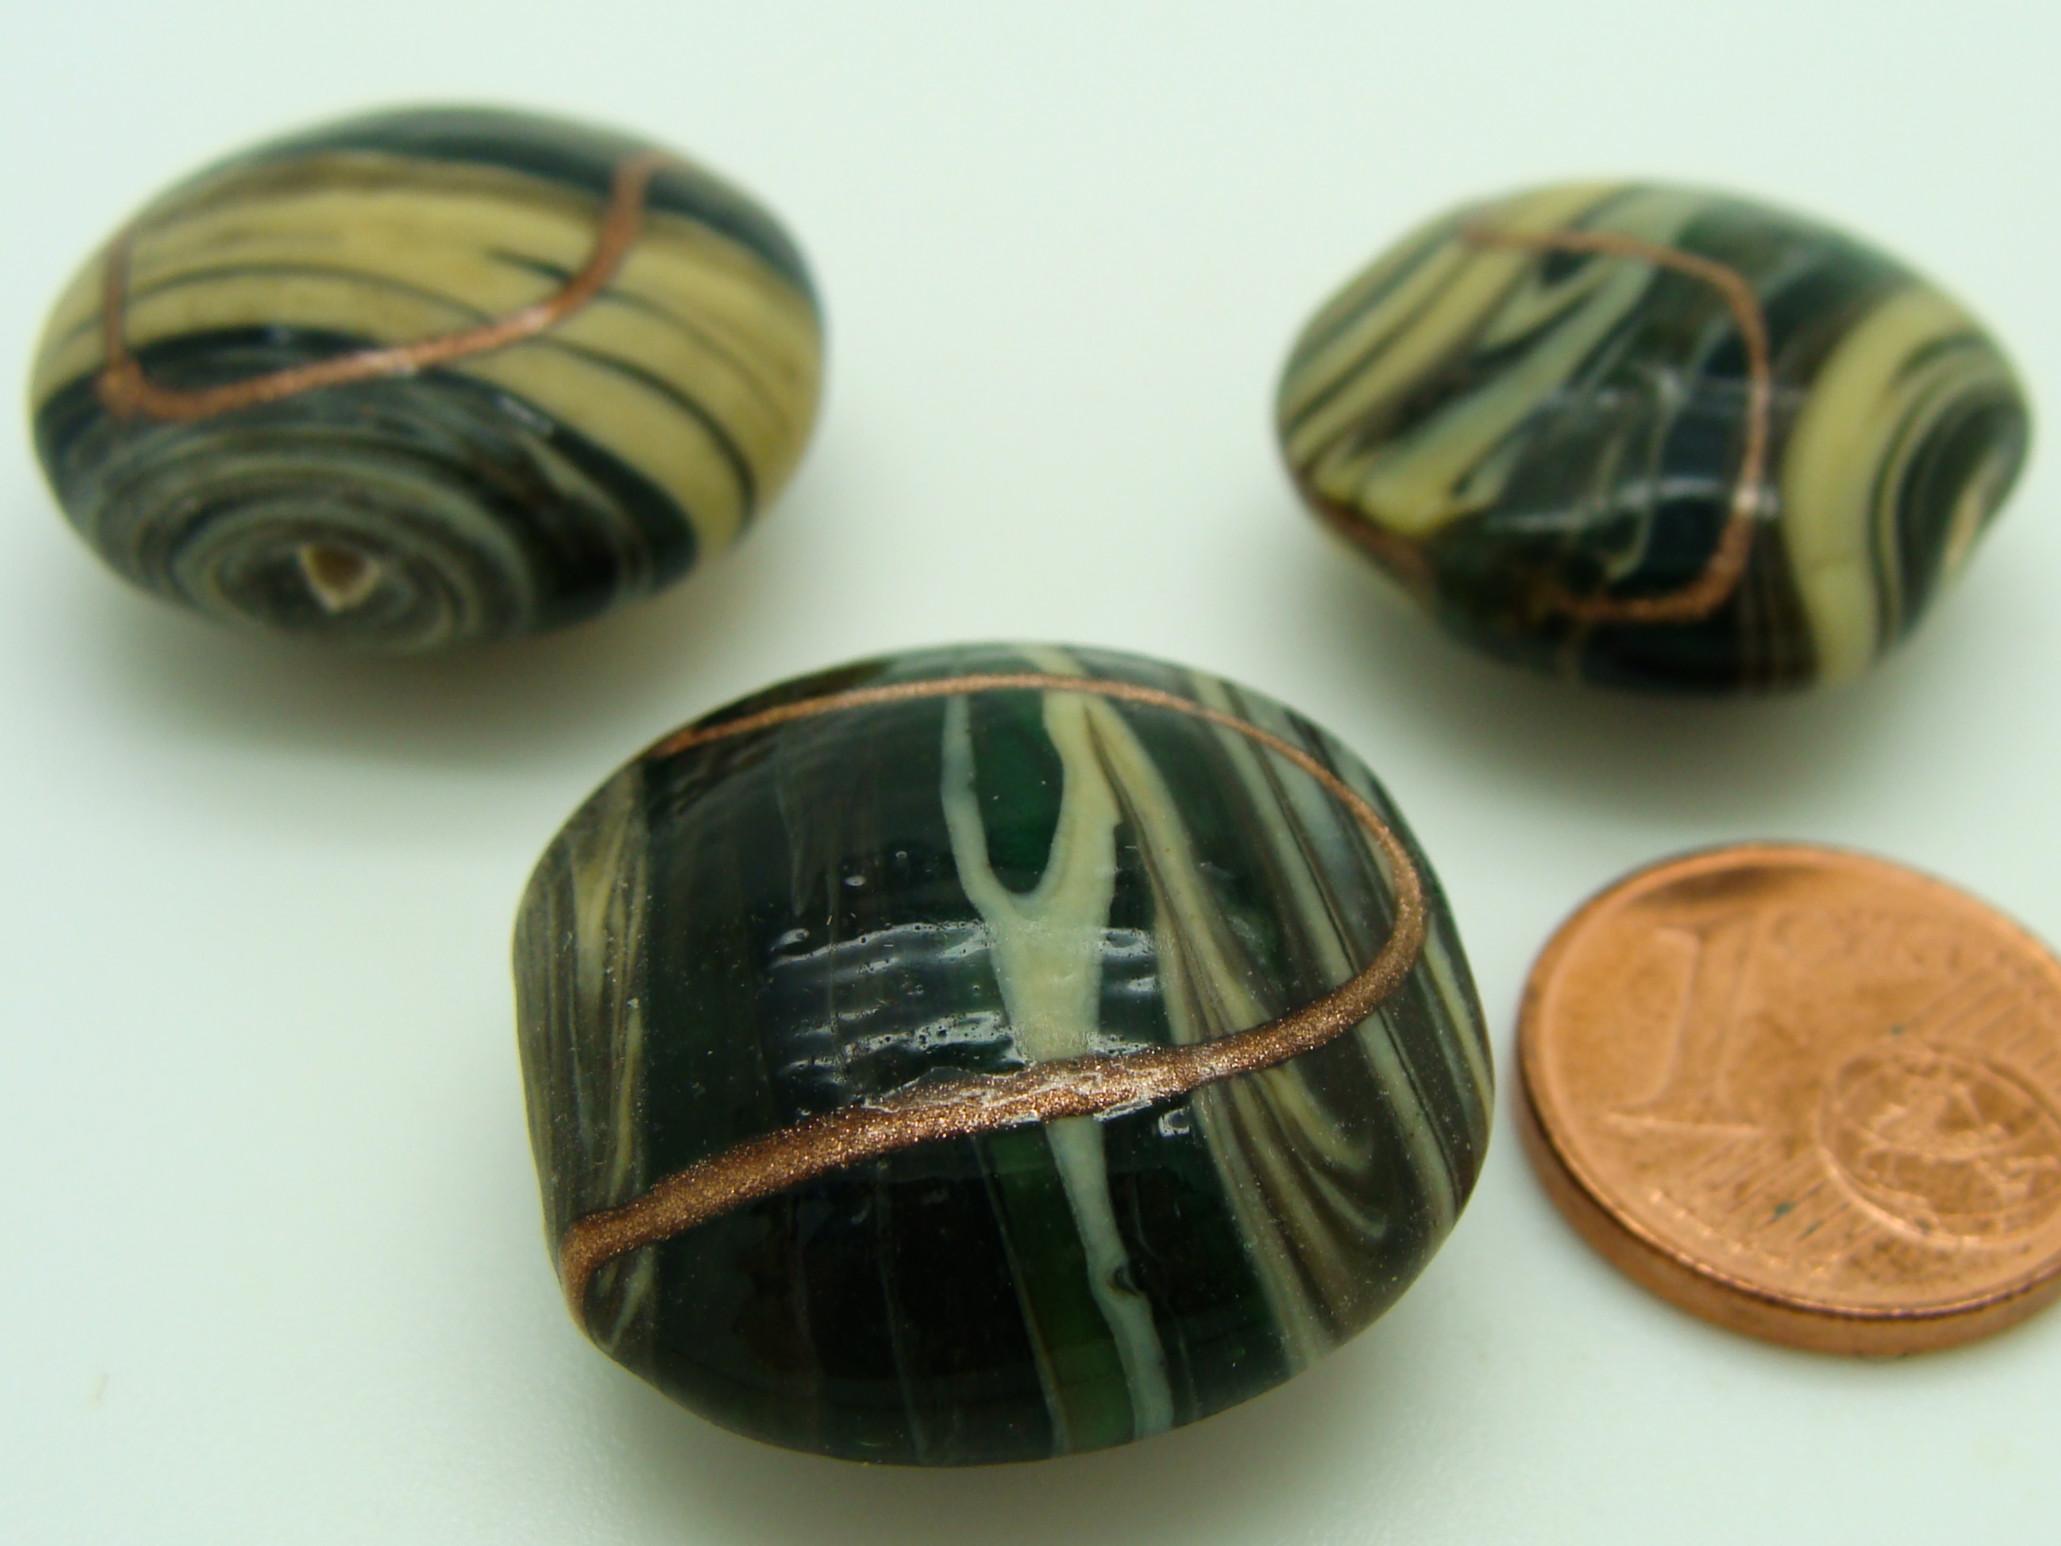 2 perles verre lampwork tubes 24mm rose motifs vert marron DIY création bijoux